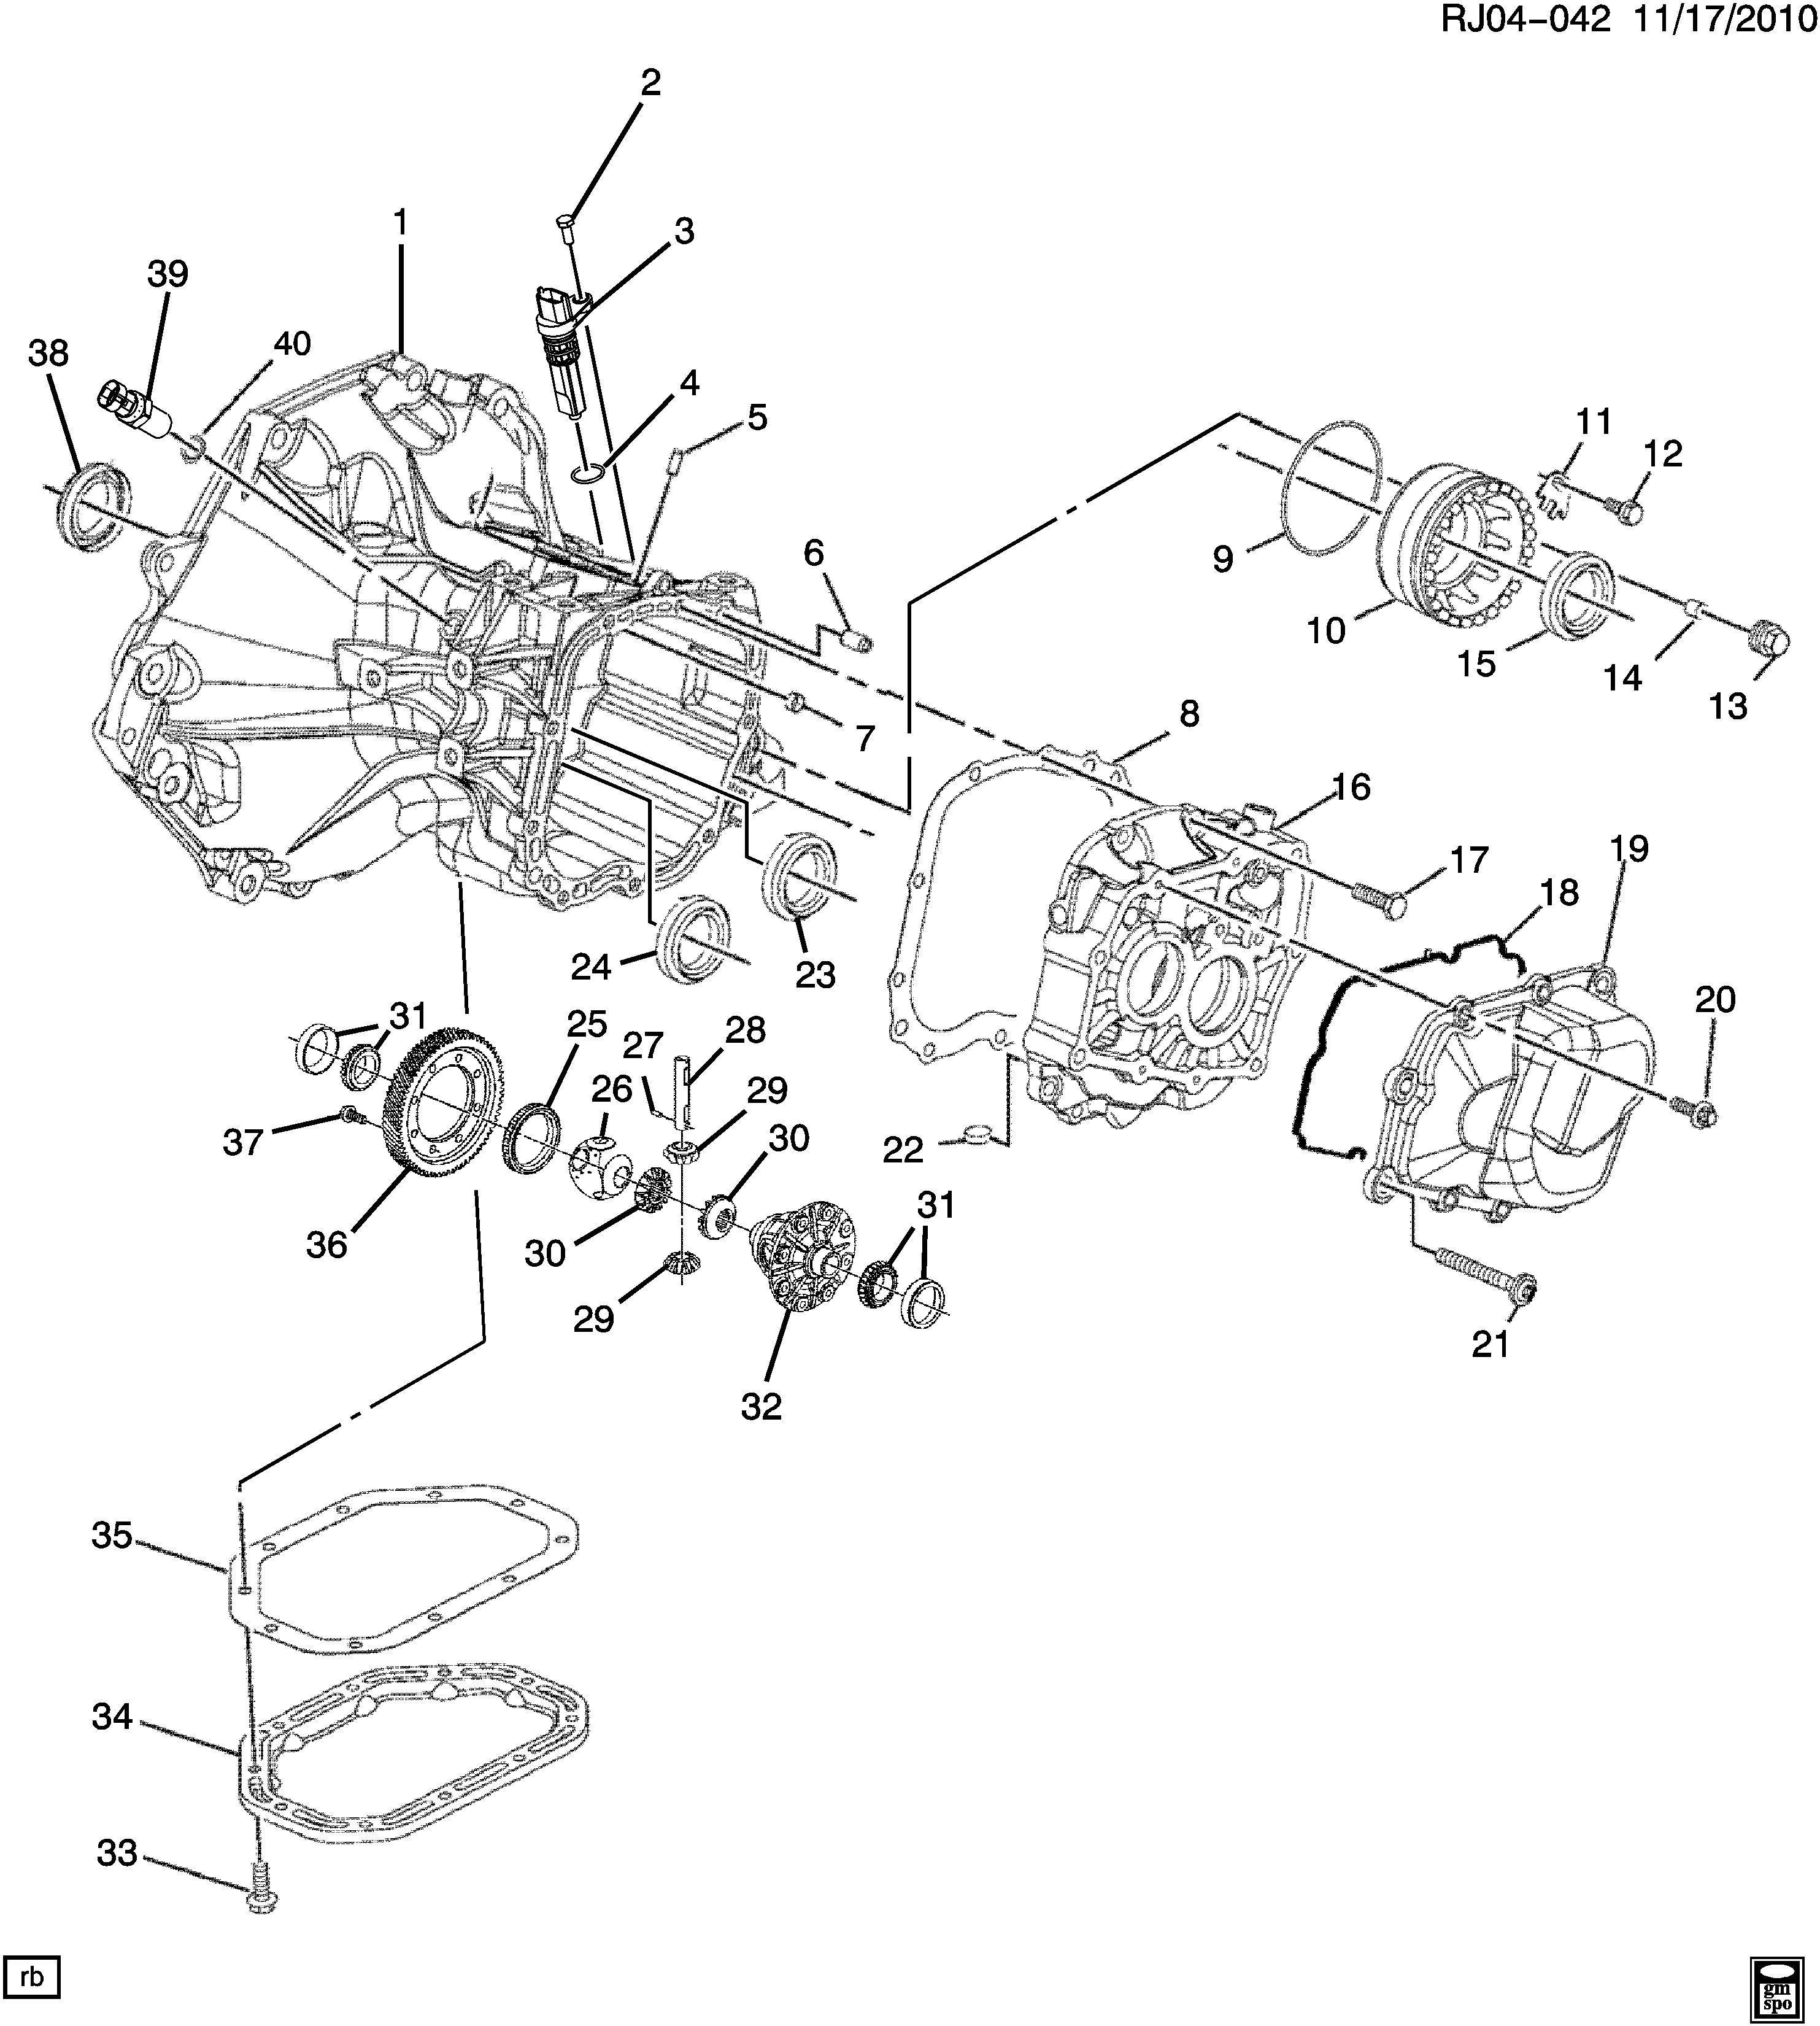 Chevrolet Trax Bearing. Transmission mainshaft center/rear